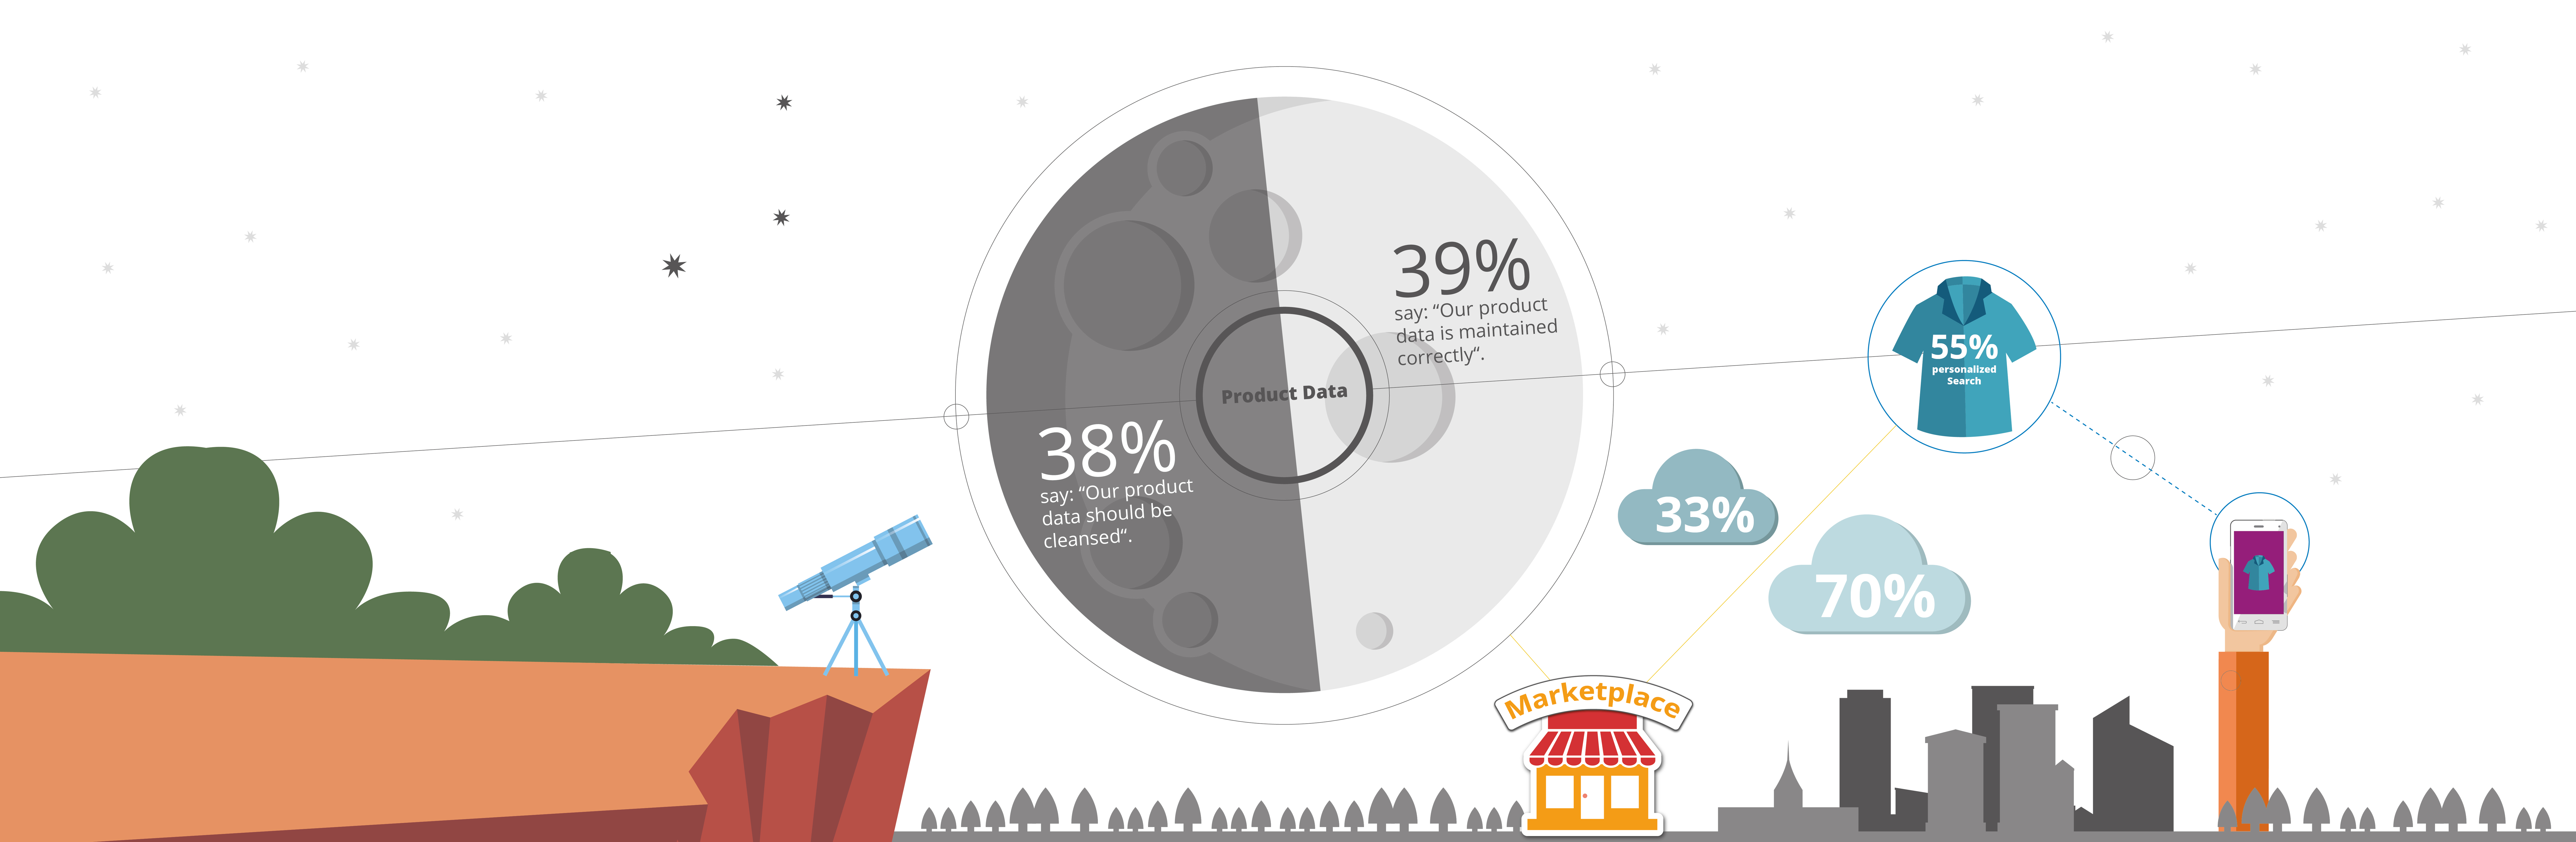 Retailer Survey